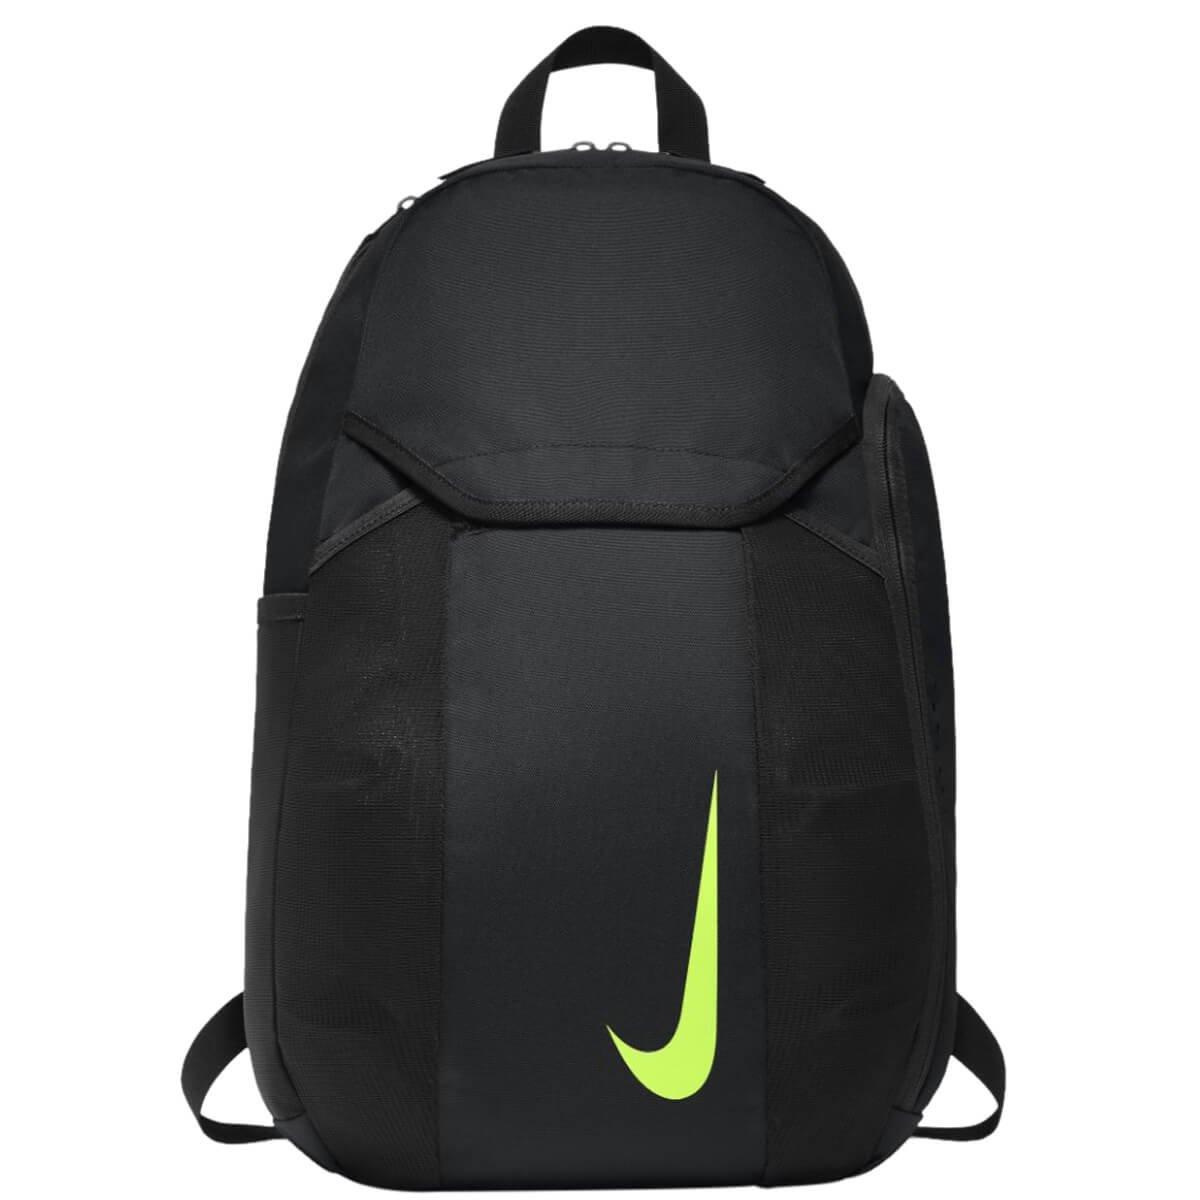 53afbc03a Bizz Store - Mochila Masculina Nike Academy 2.0